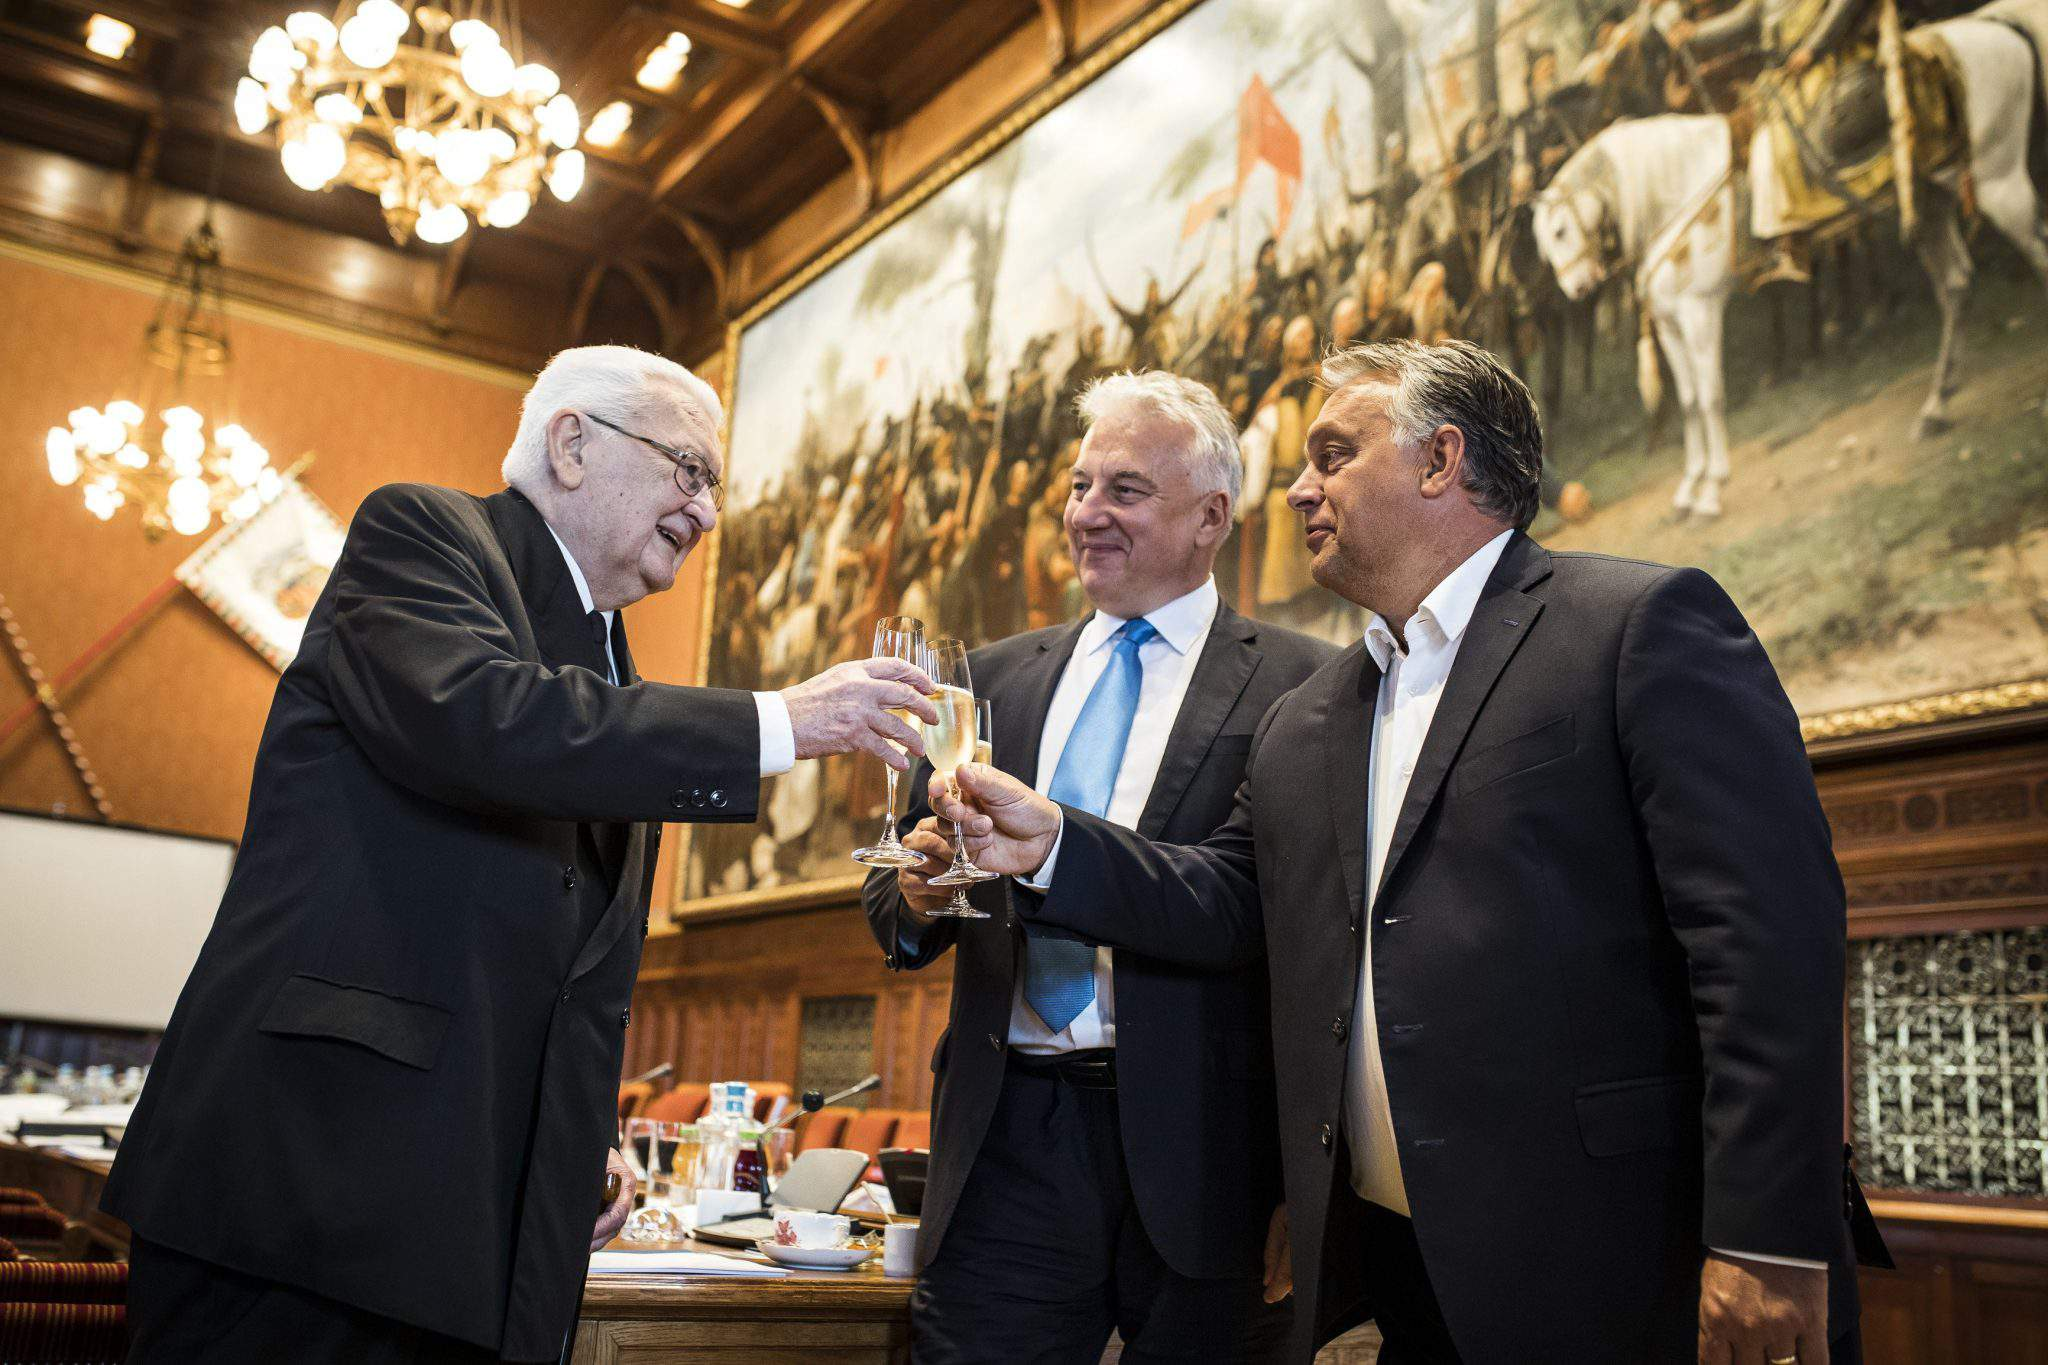 fidesz christion democrats